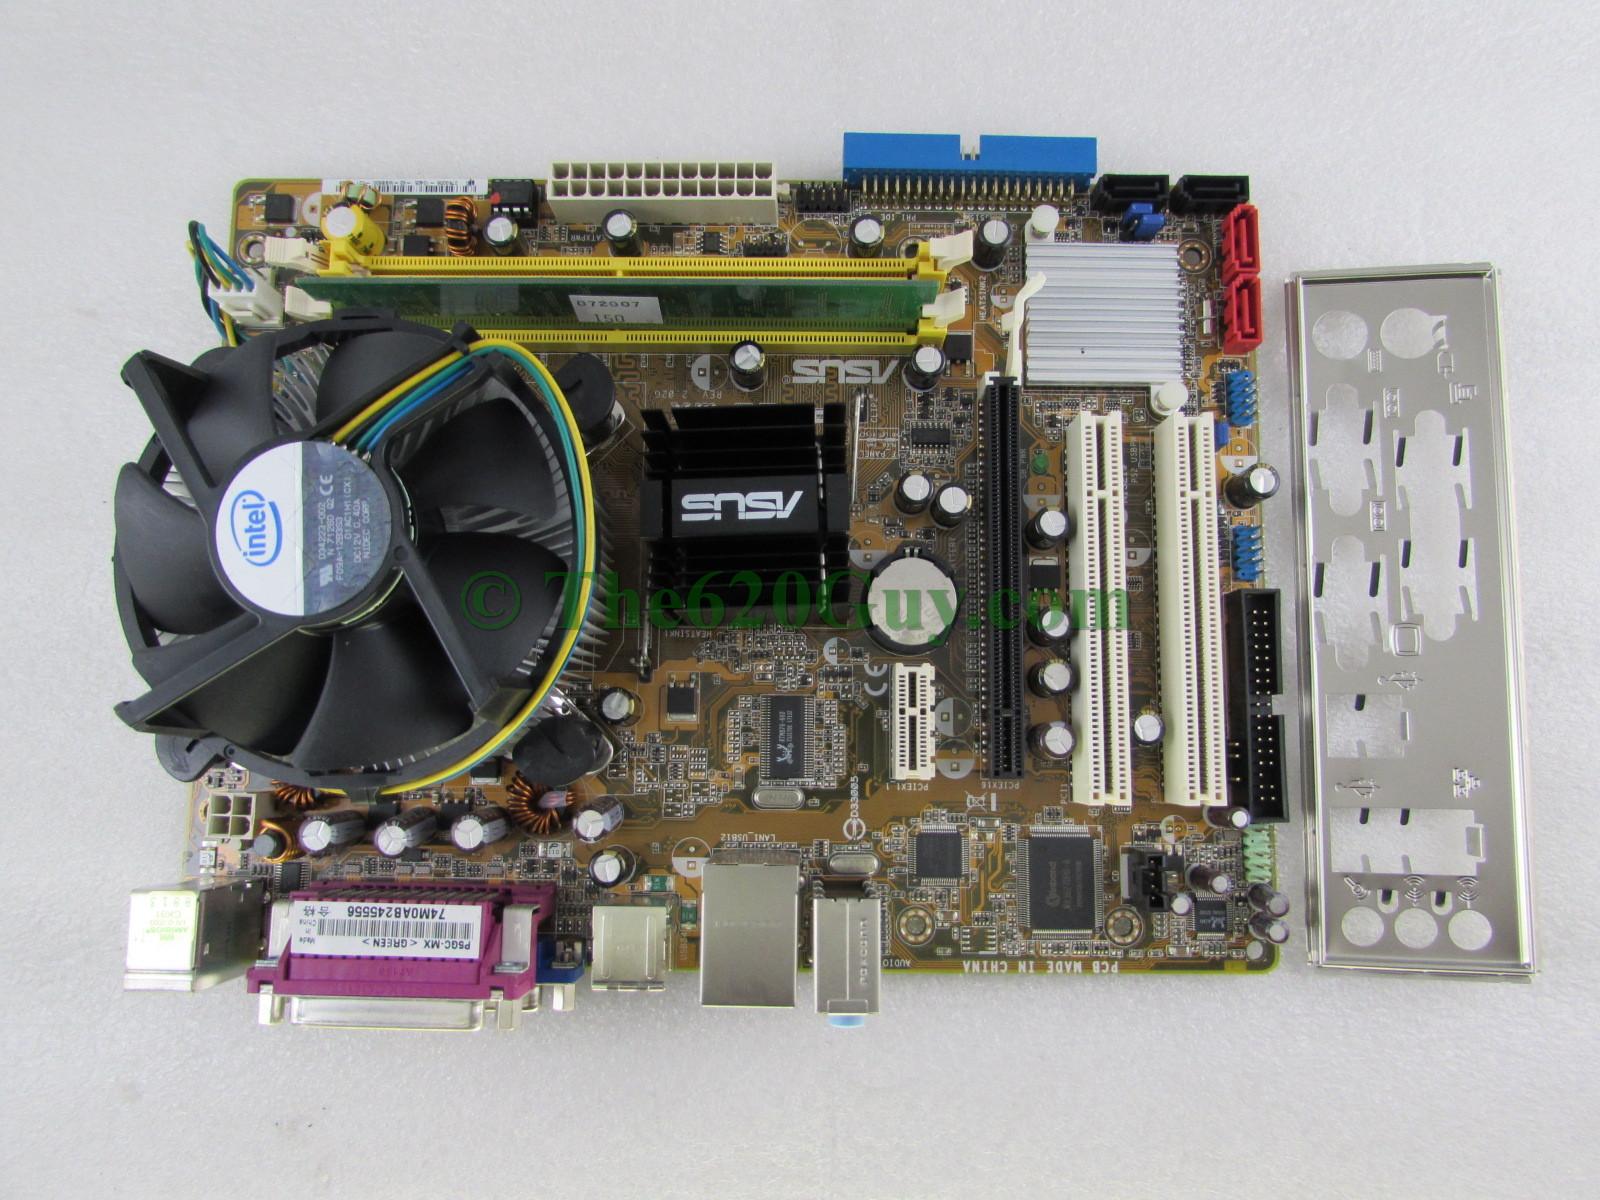 Intel i845g audio